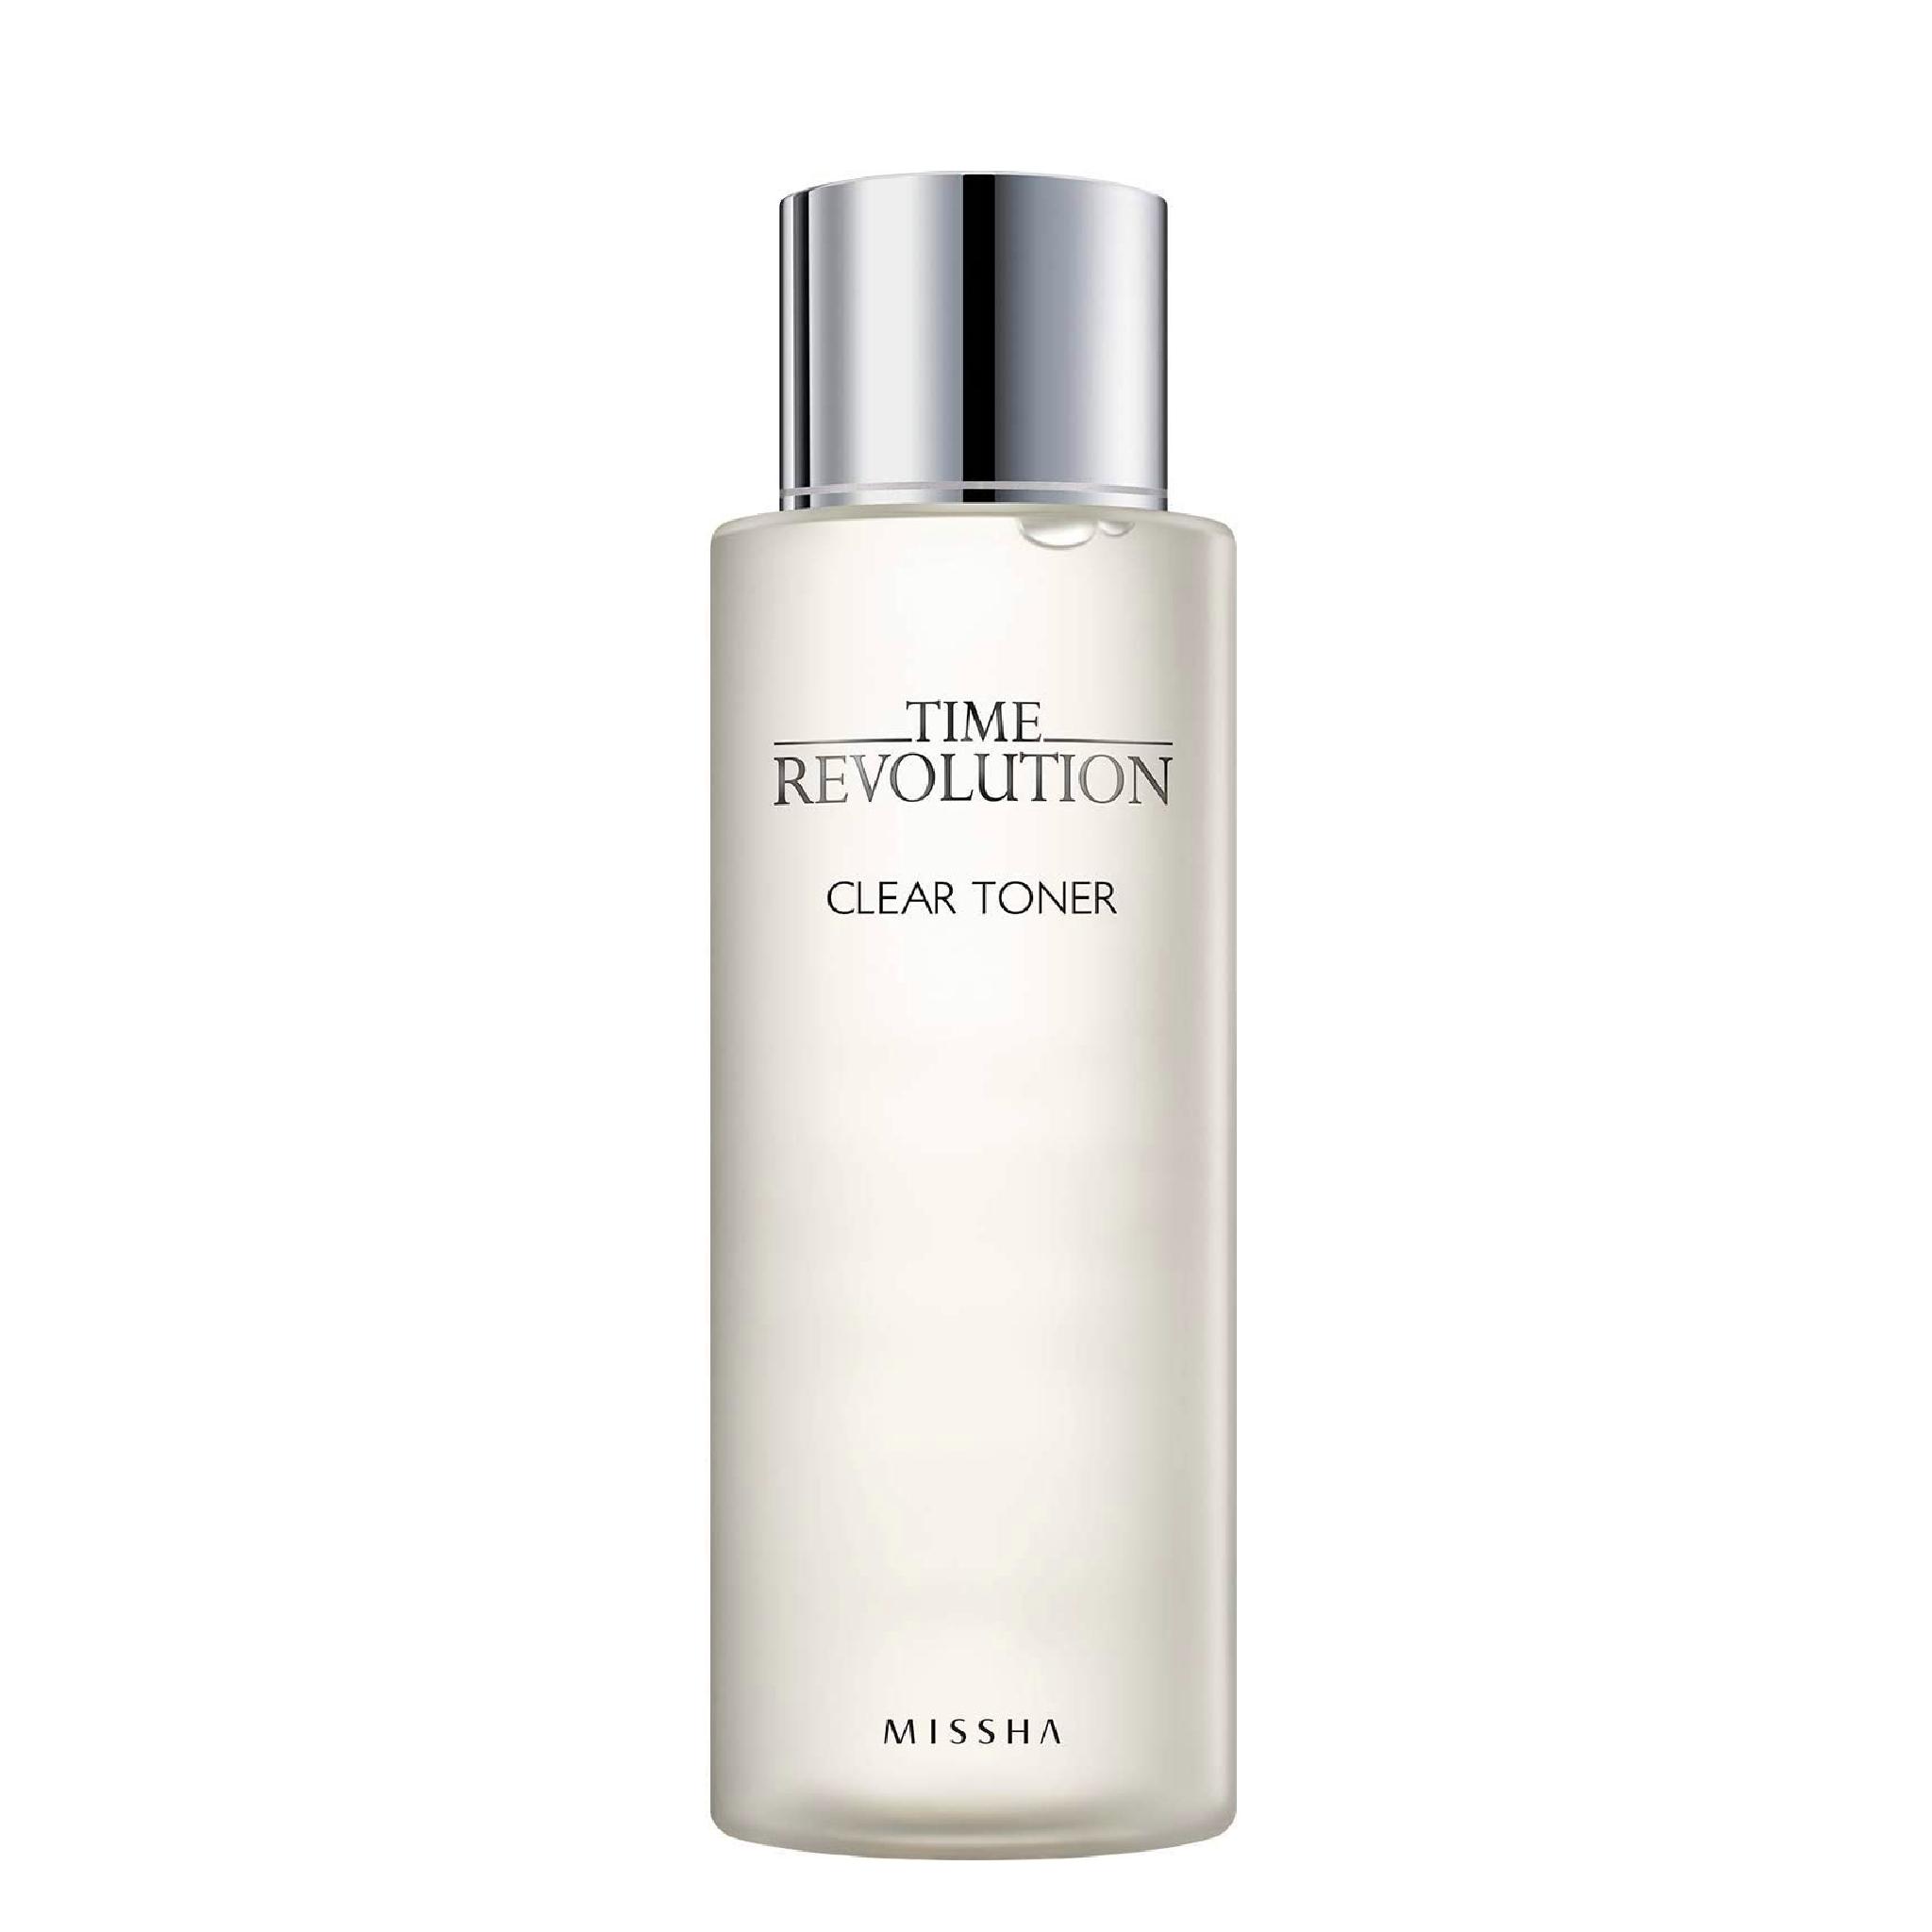 Korean Beauty Products - Missha Time Revolution Clear Toner